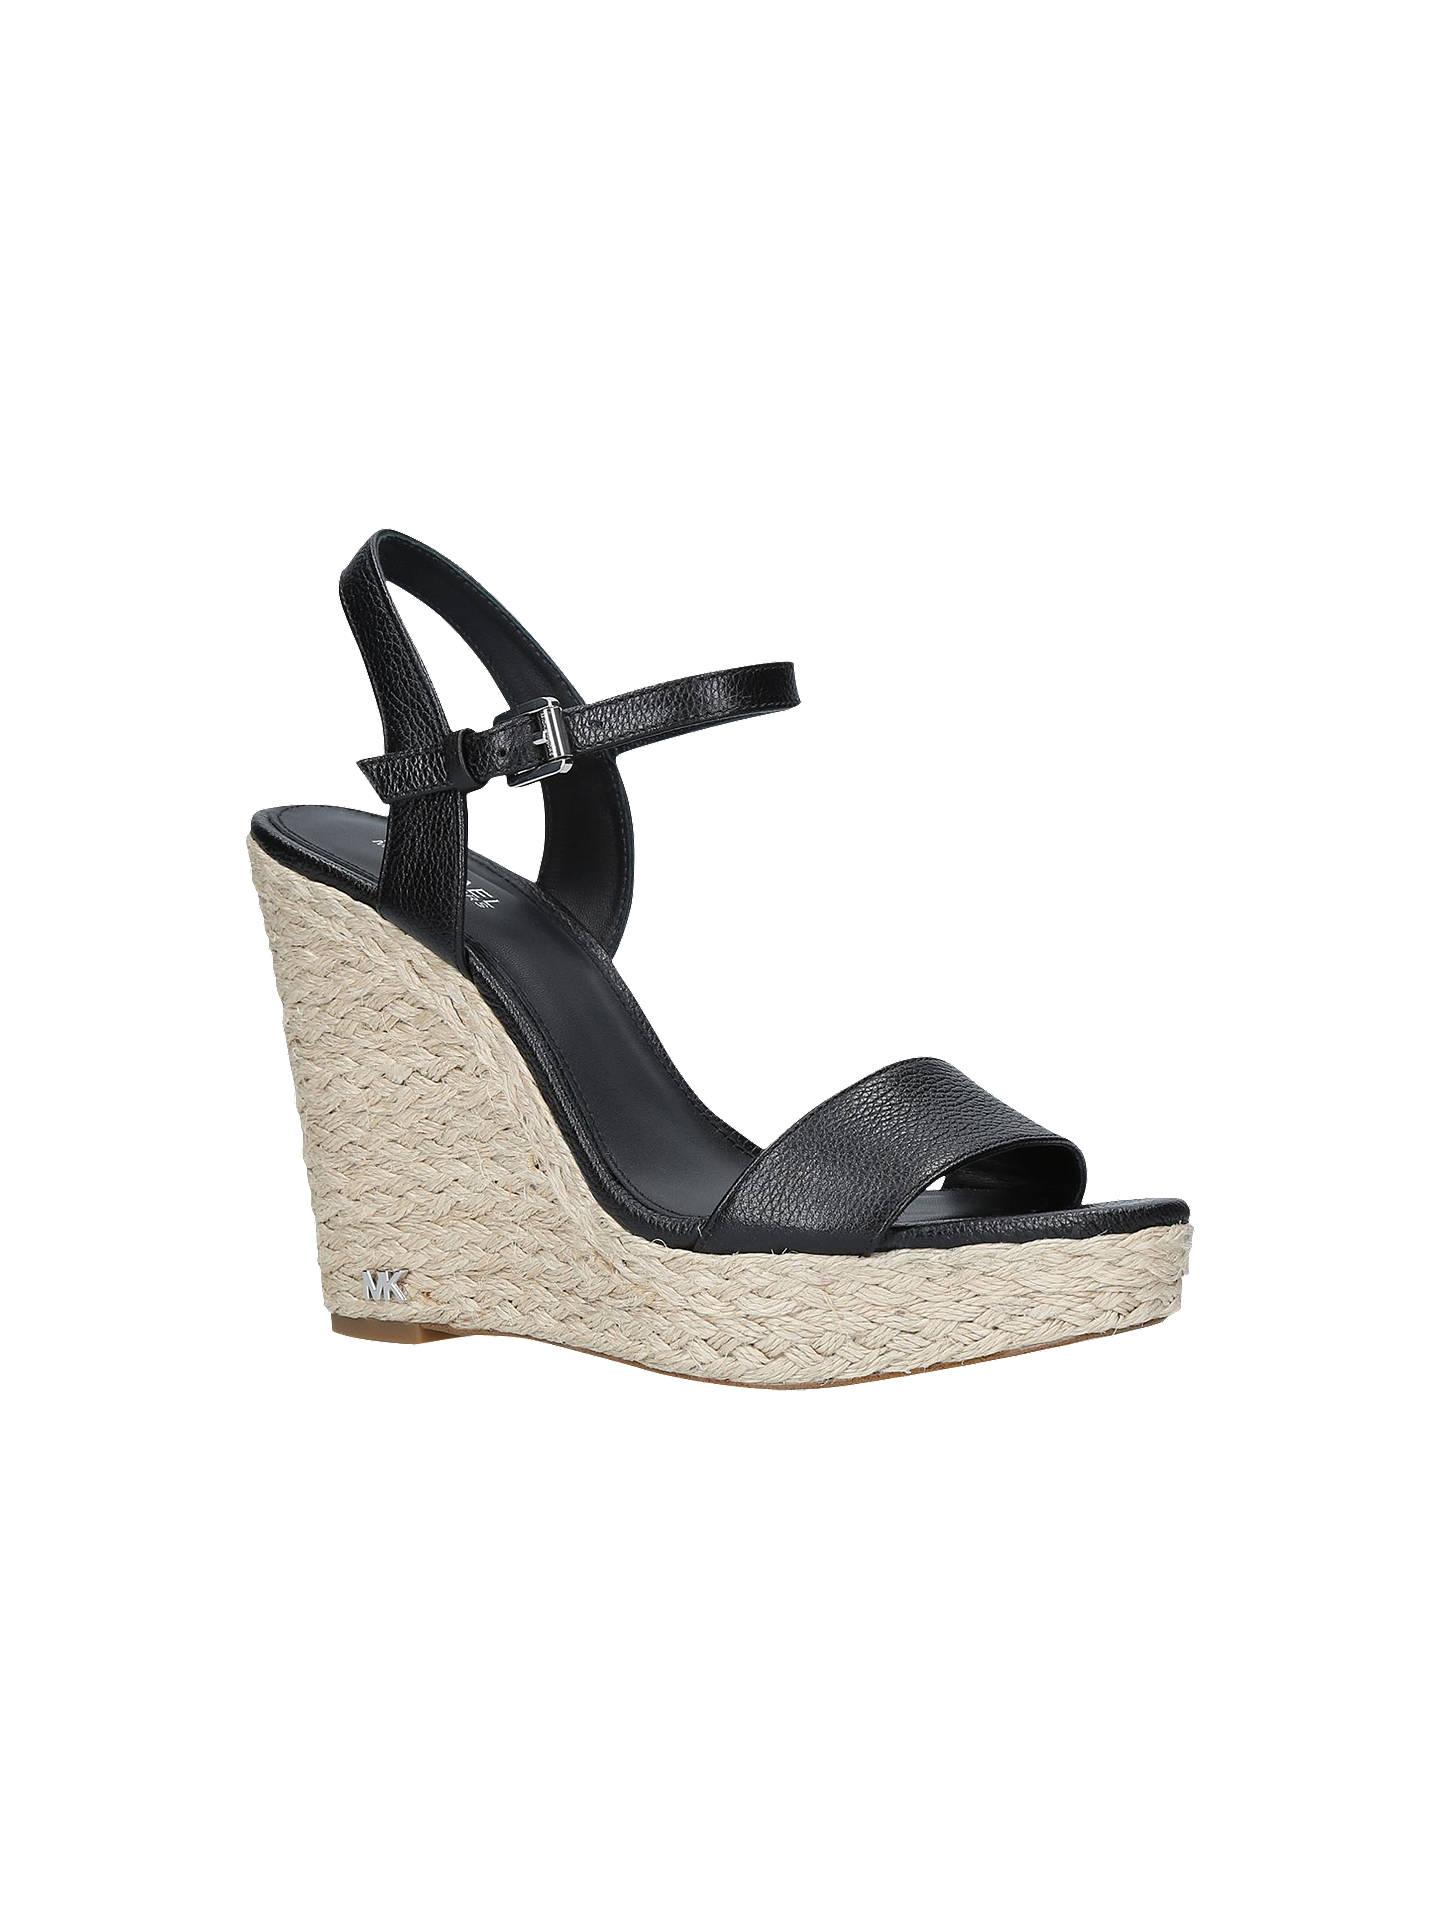 f9c1f55b387 MICHAEL Michael Kors Jill Wedge Heel Sandals at John Lewis & Partners